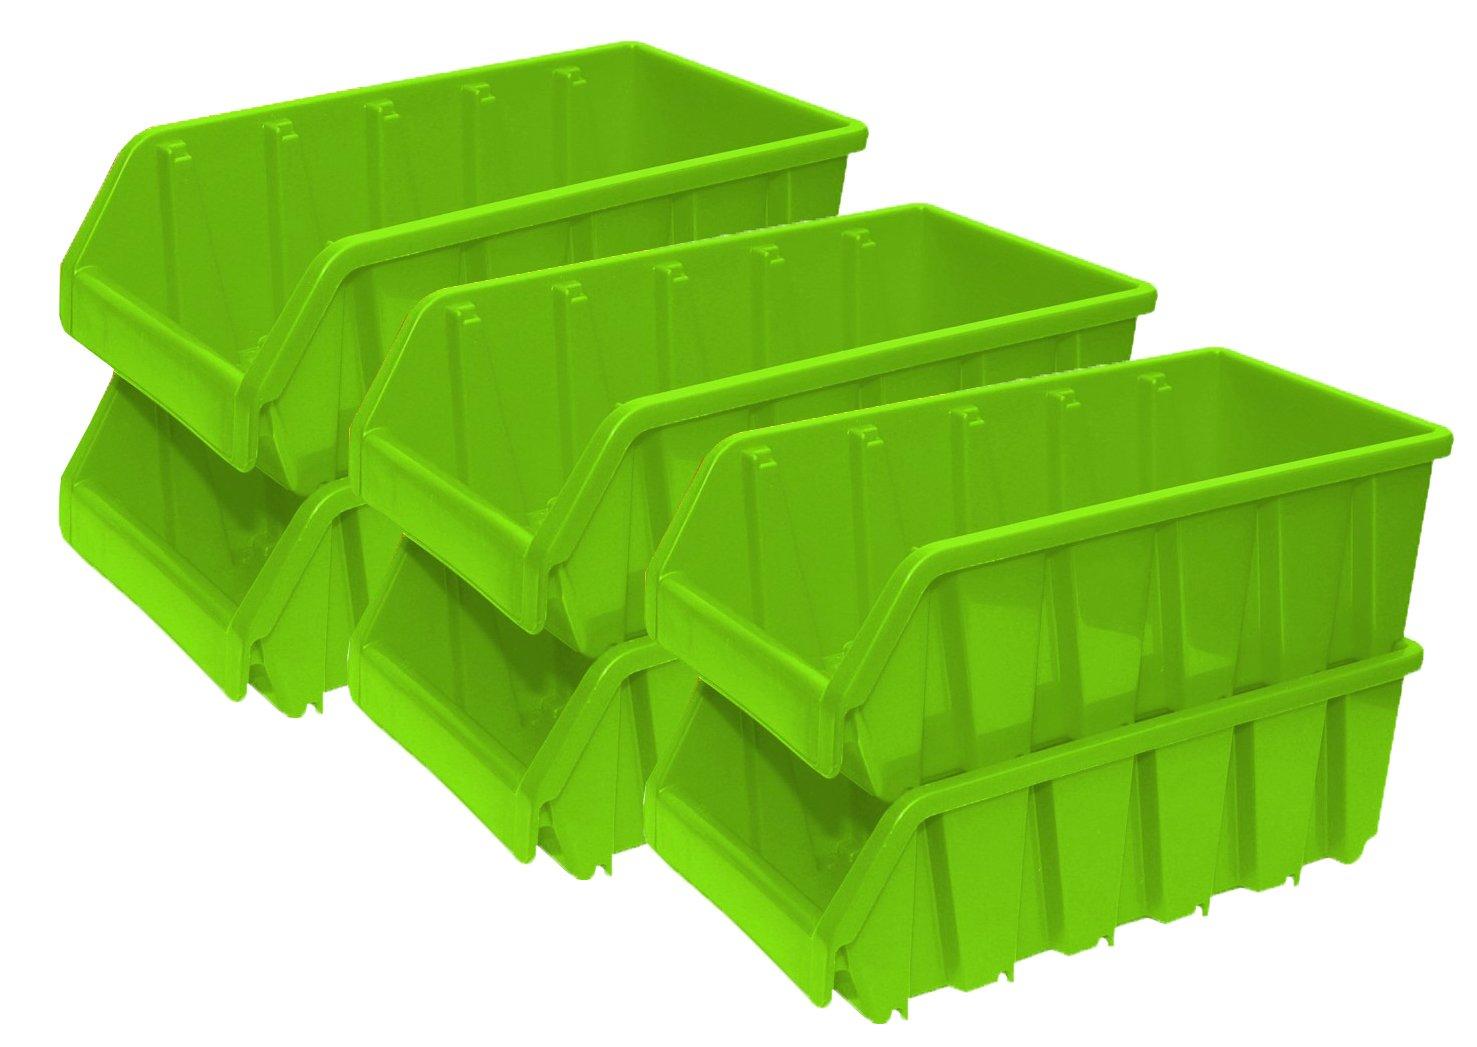 Basicwise QI003255G.6 Plastic Storage Stacking, Set of 6 Green, 6 Piece